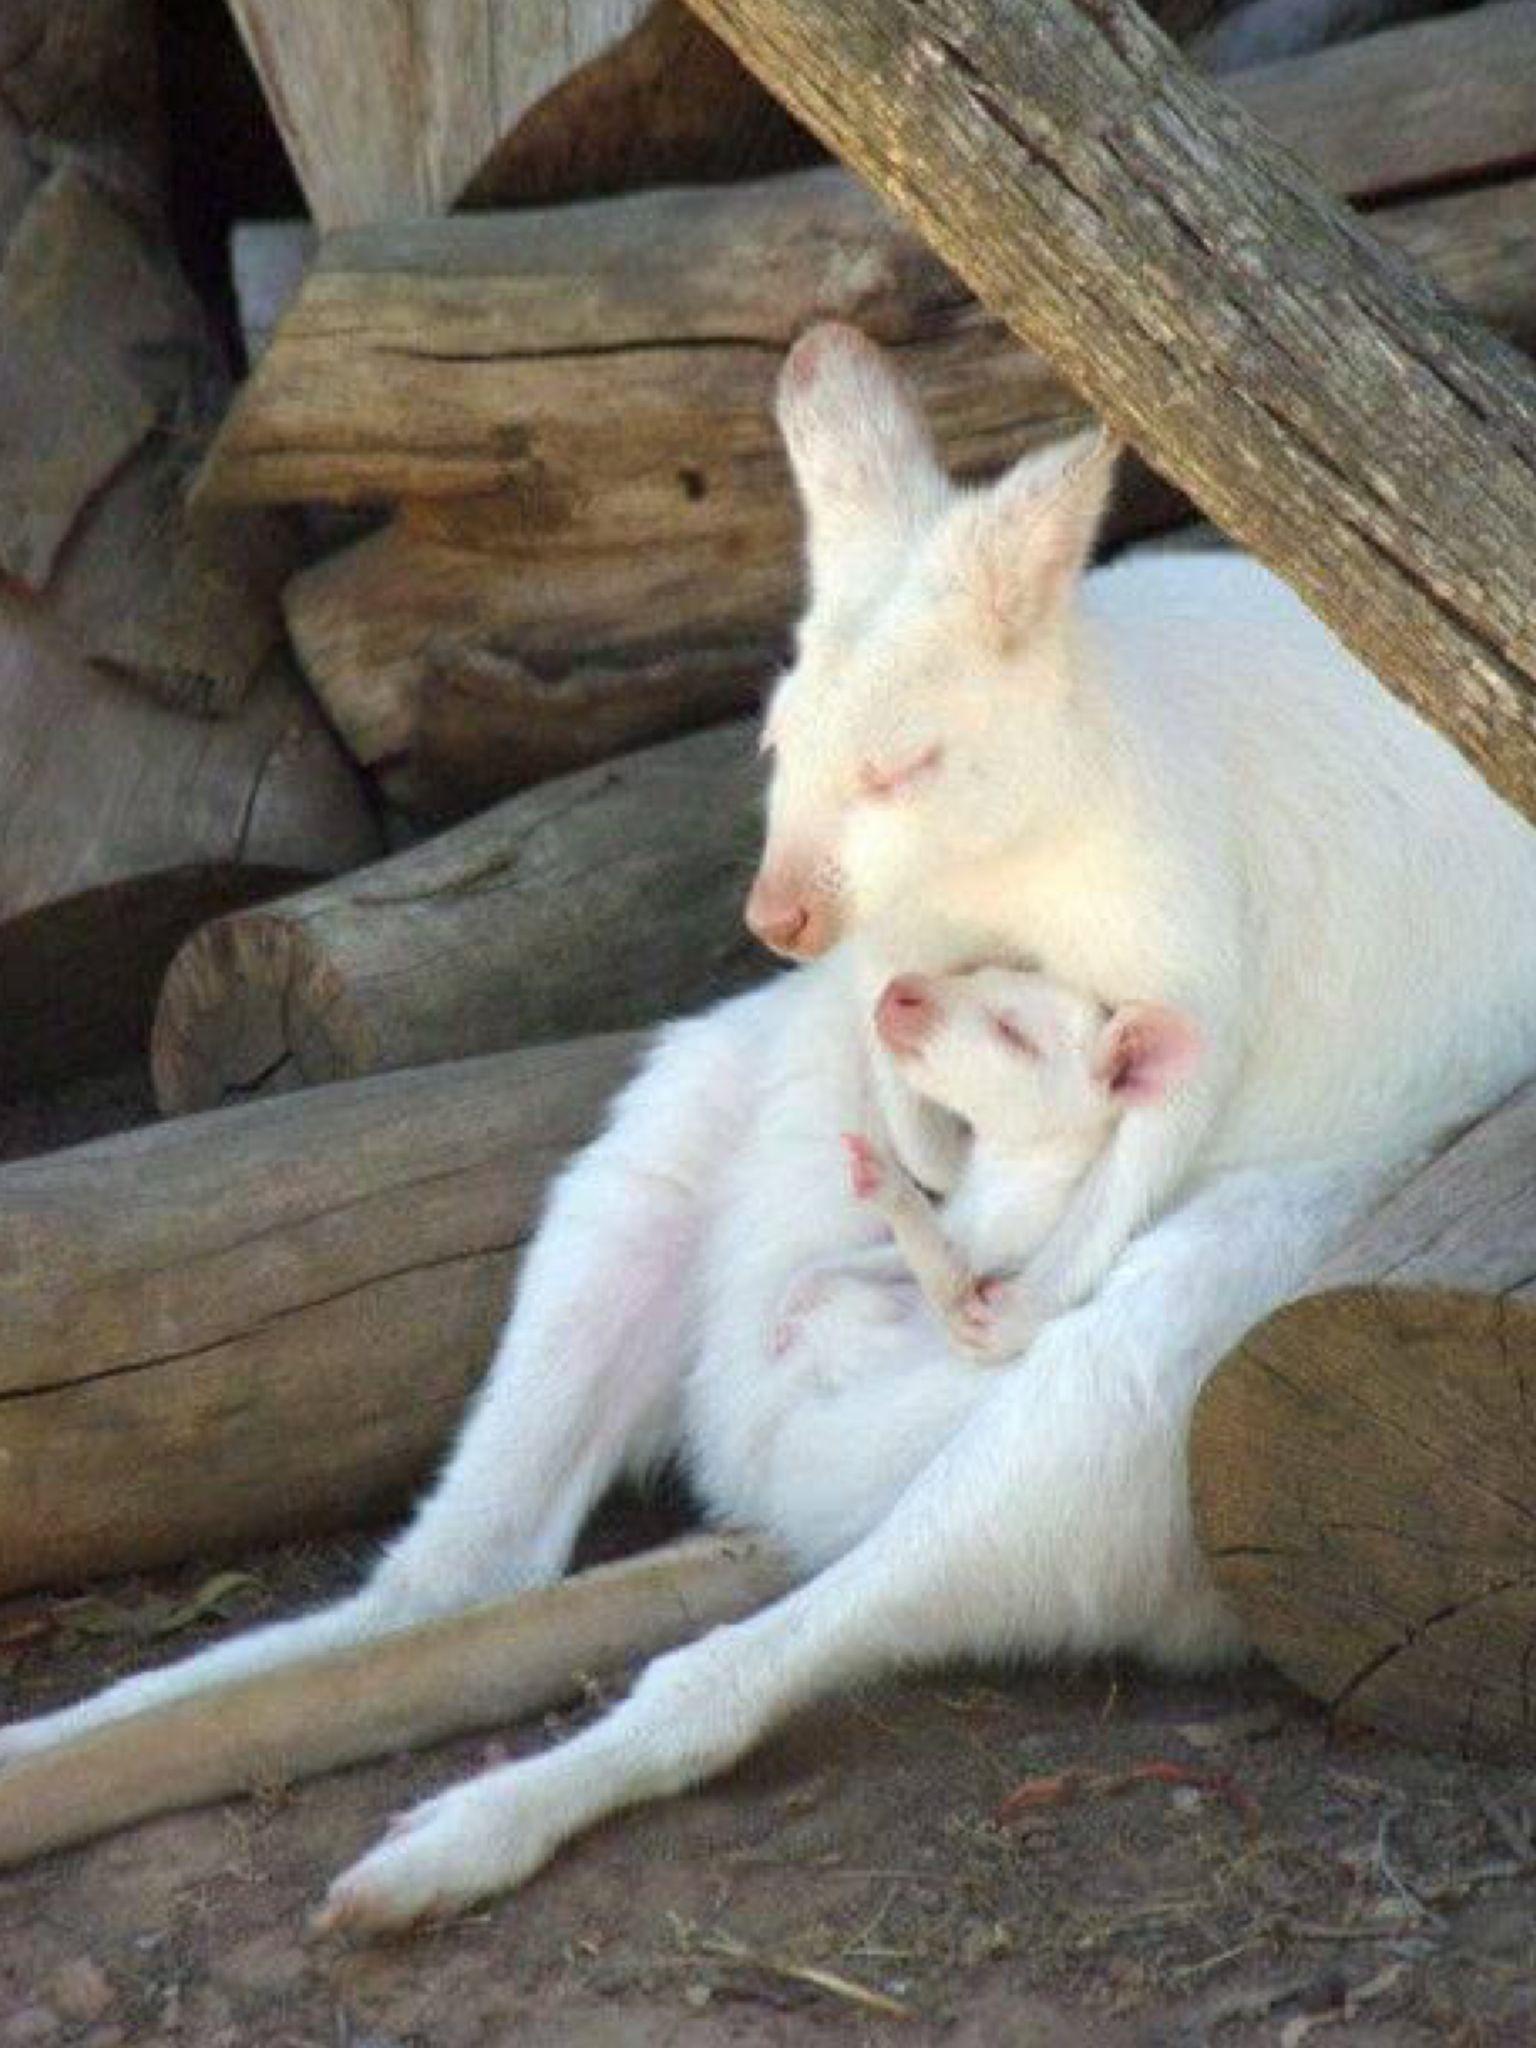 ANIMALS Albino animals, Rare albino animals, Rare animals